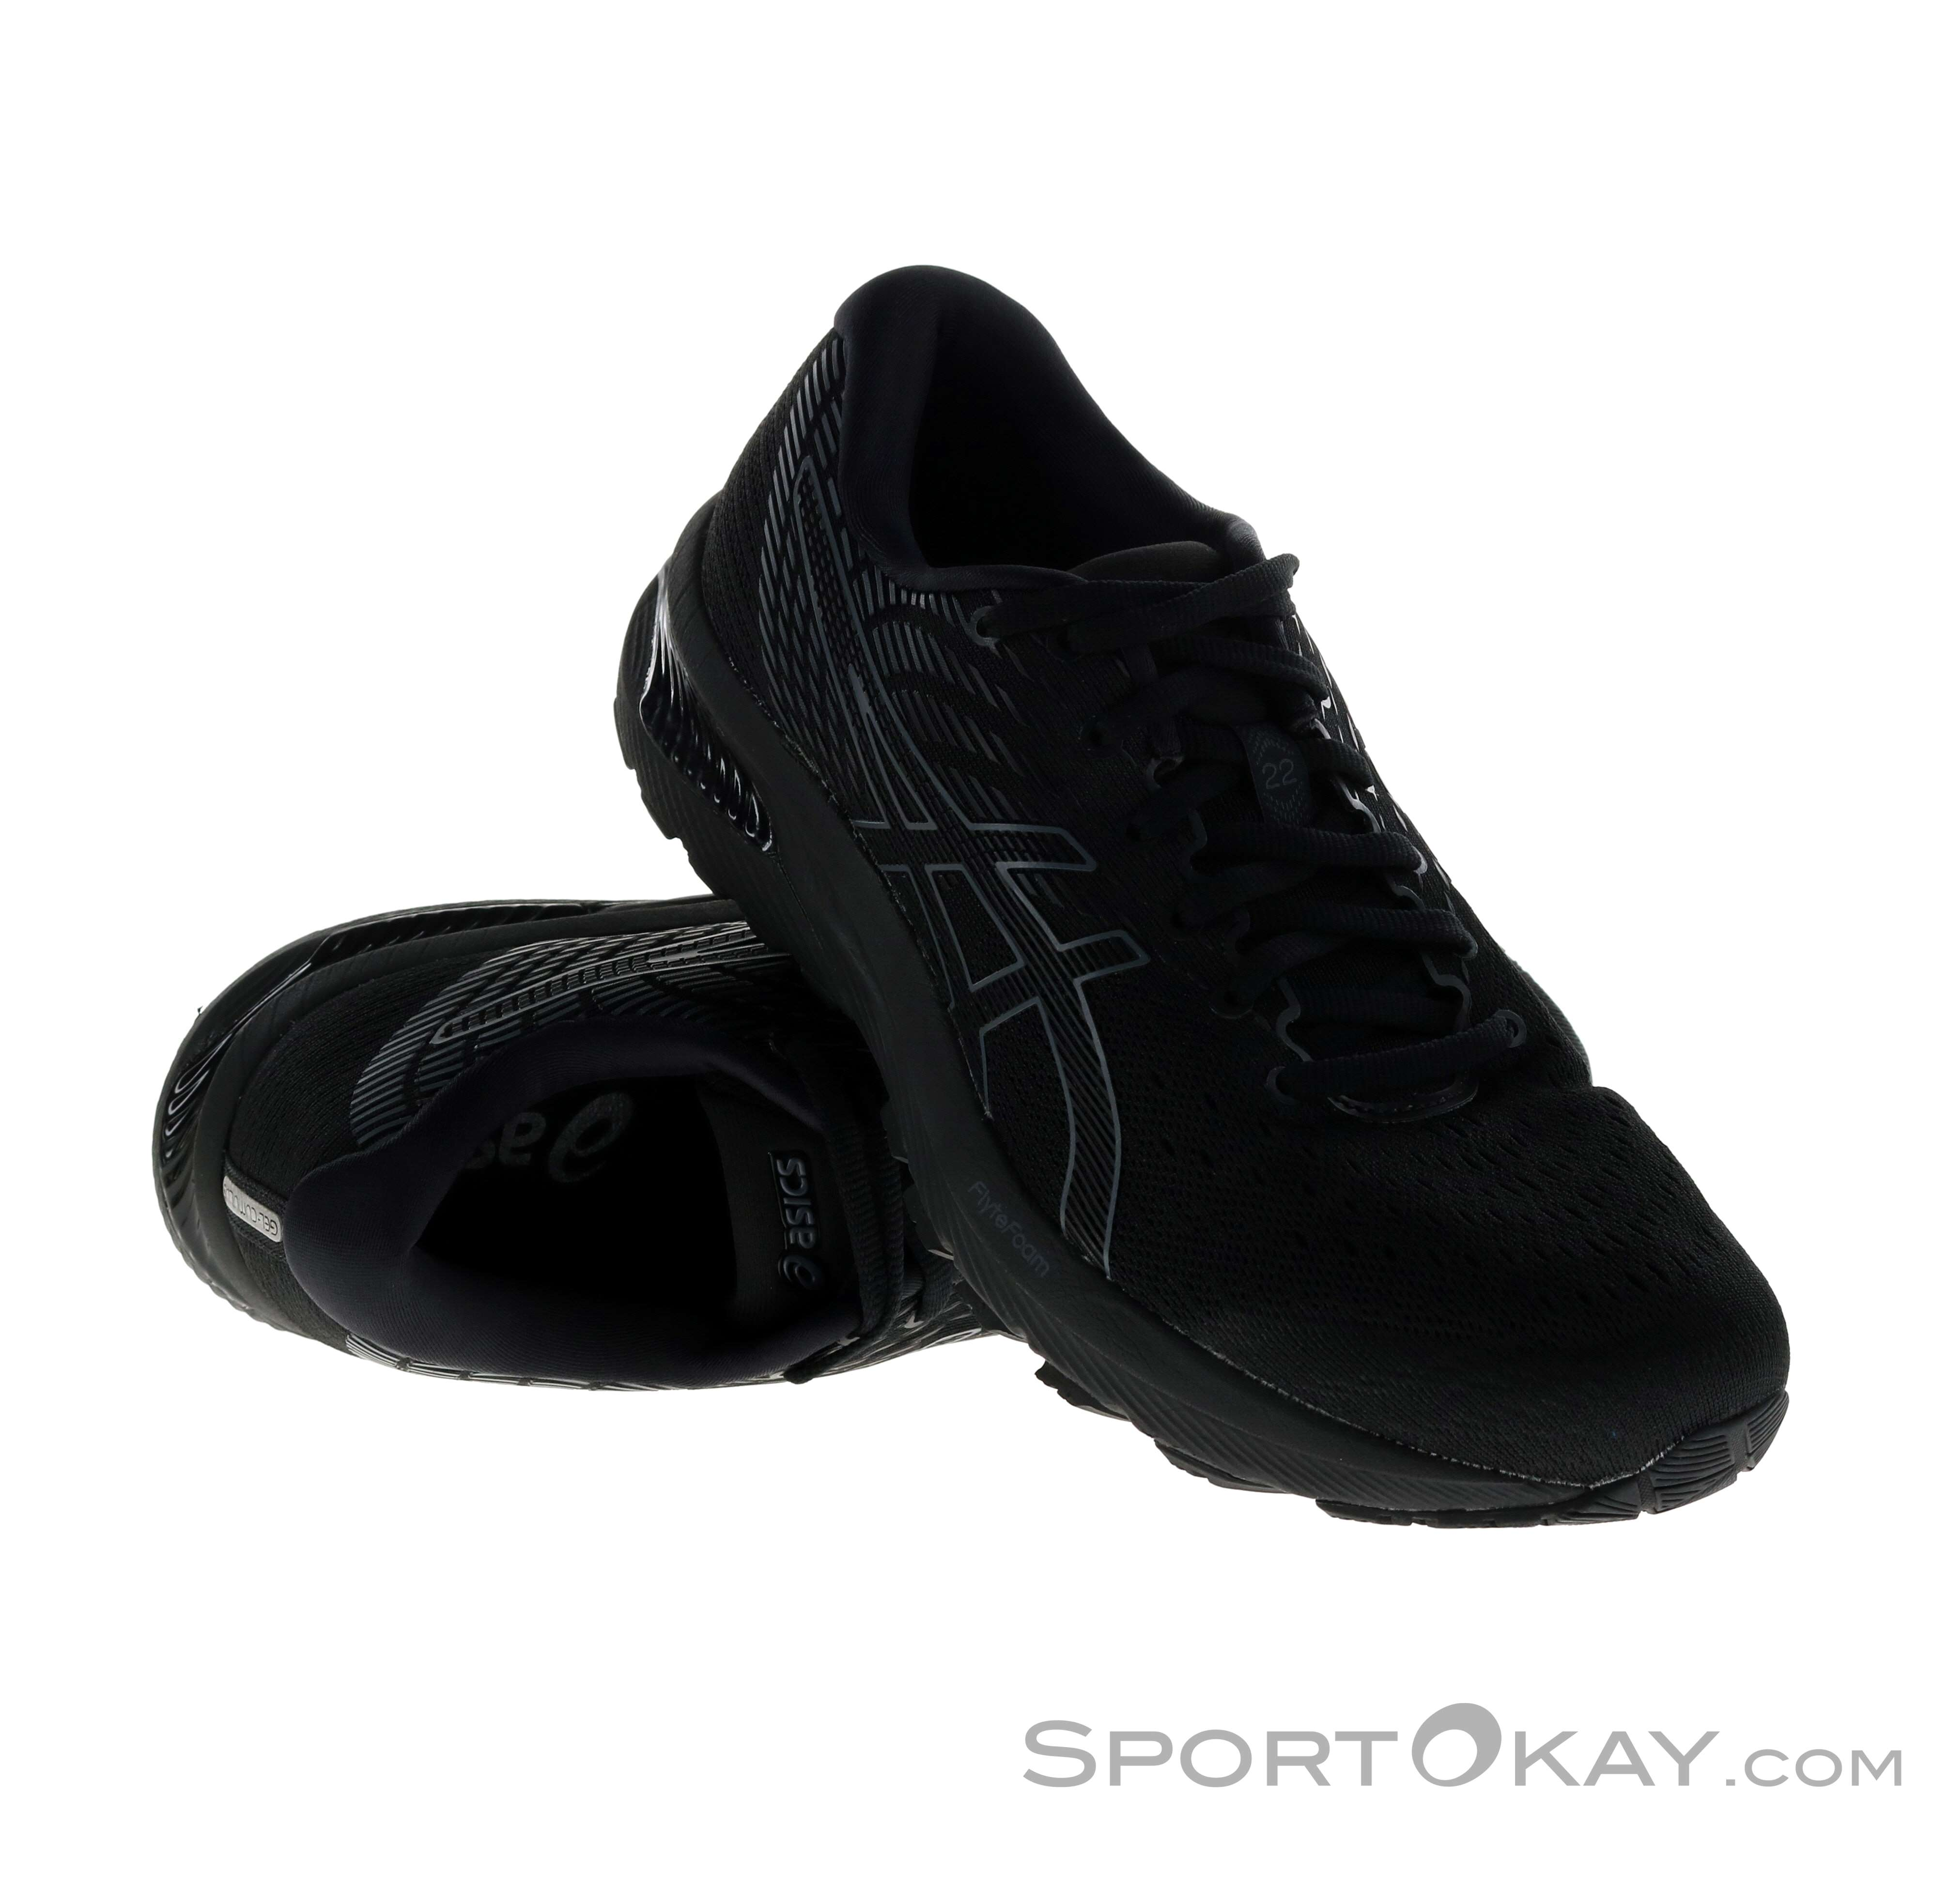 Asics Gel Cumulus 22 Mens Running Shoes - Running Shoes - Running ...